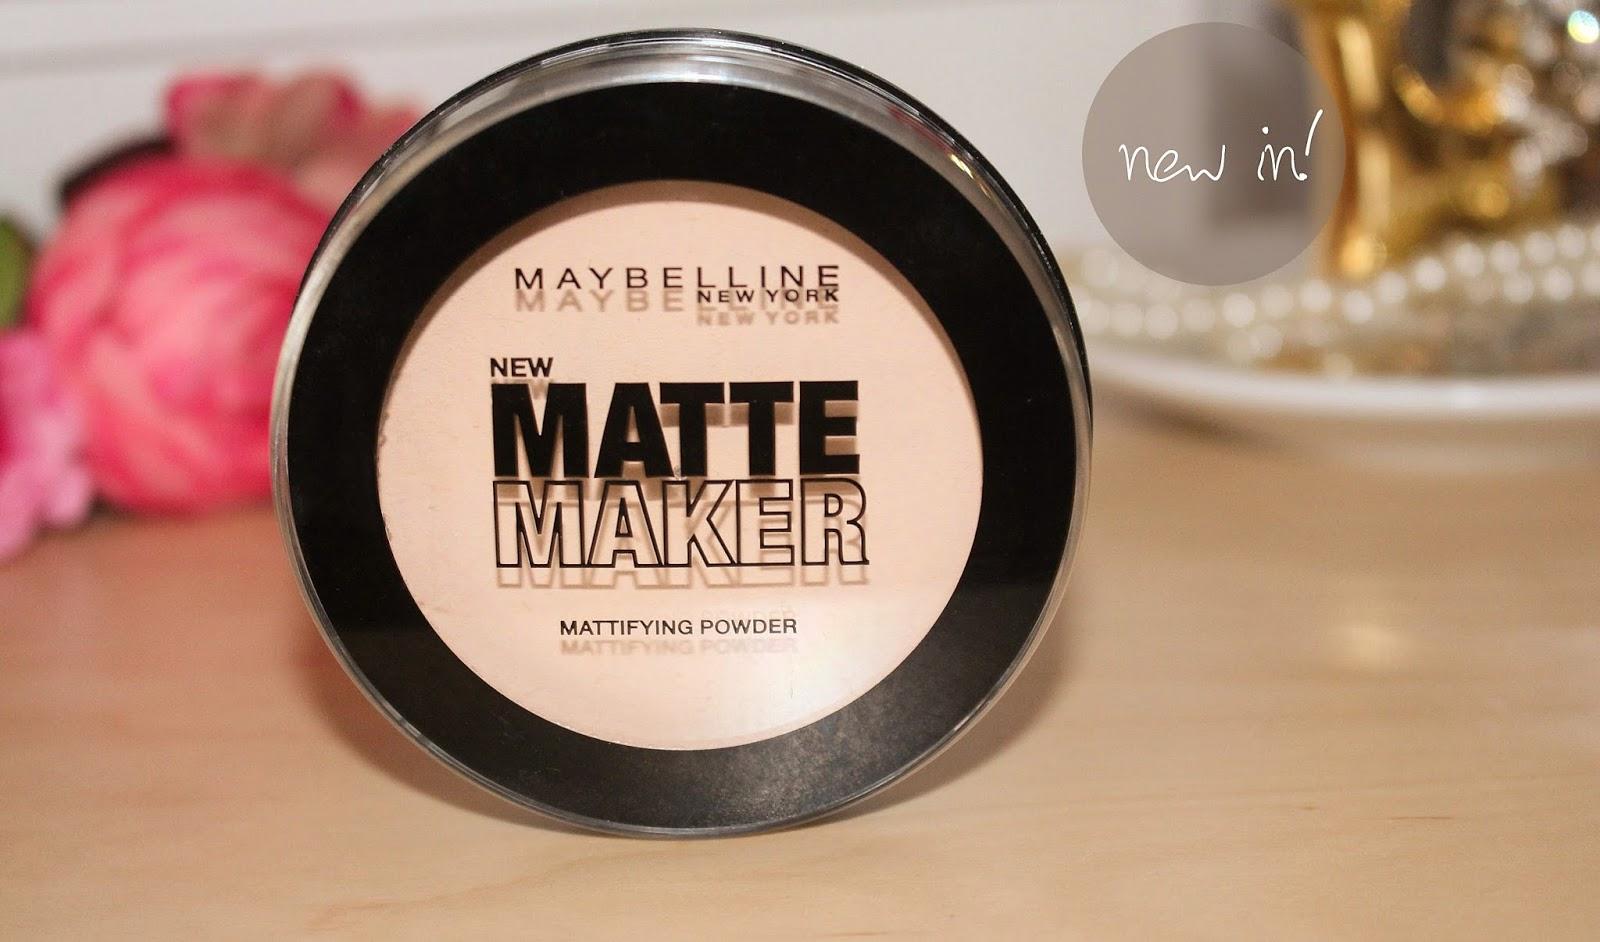 Poudre Matte Maker Nude Beige   MAYBELLINE   SAGA Cosmetics